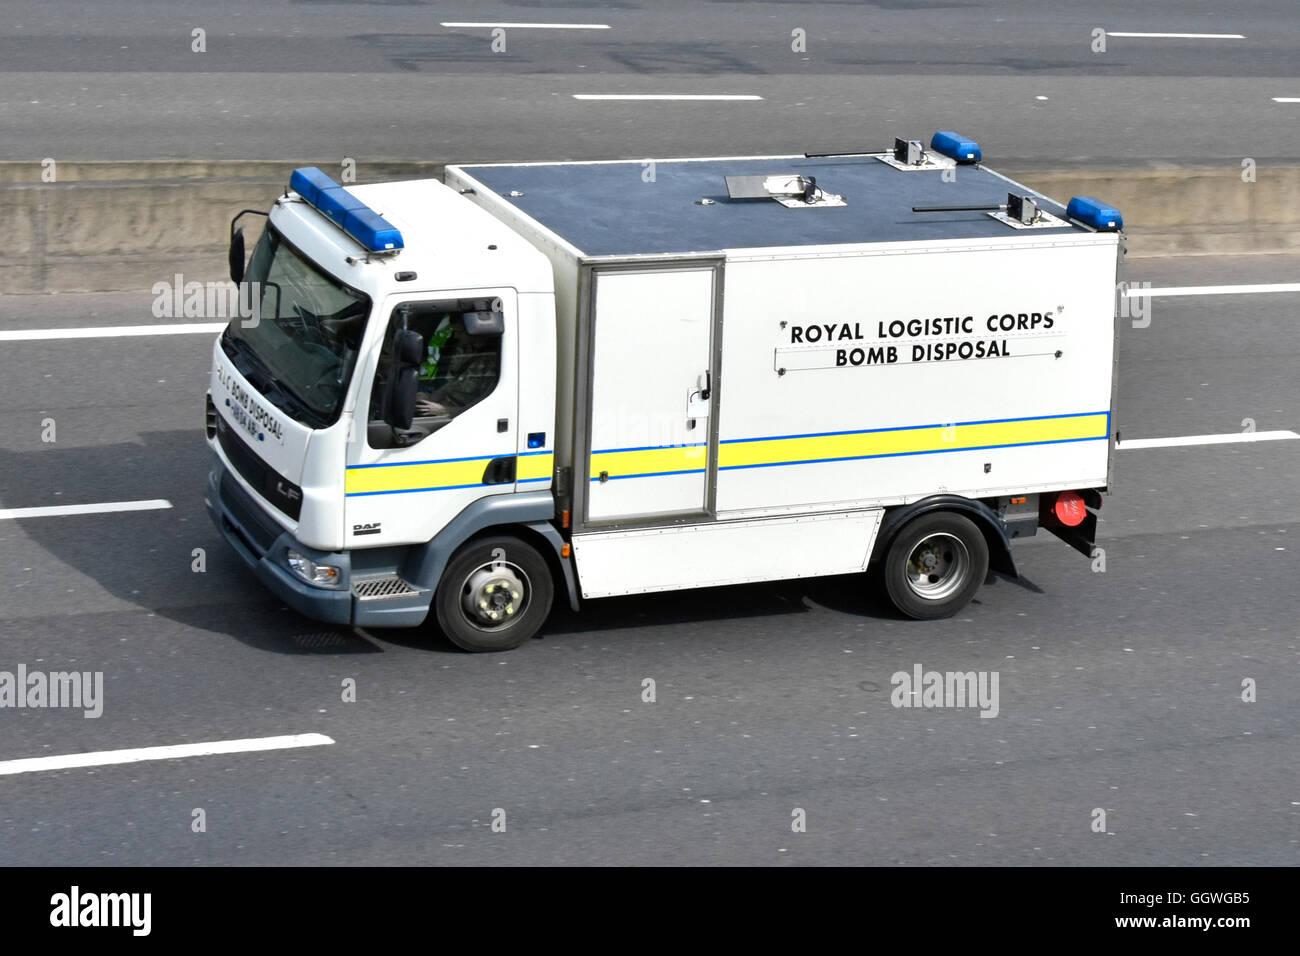 British Army Royal Logistic Corps Bomb Disposal lorry on Uk motorway England - Stock Image